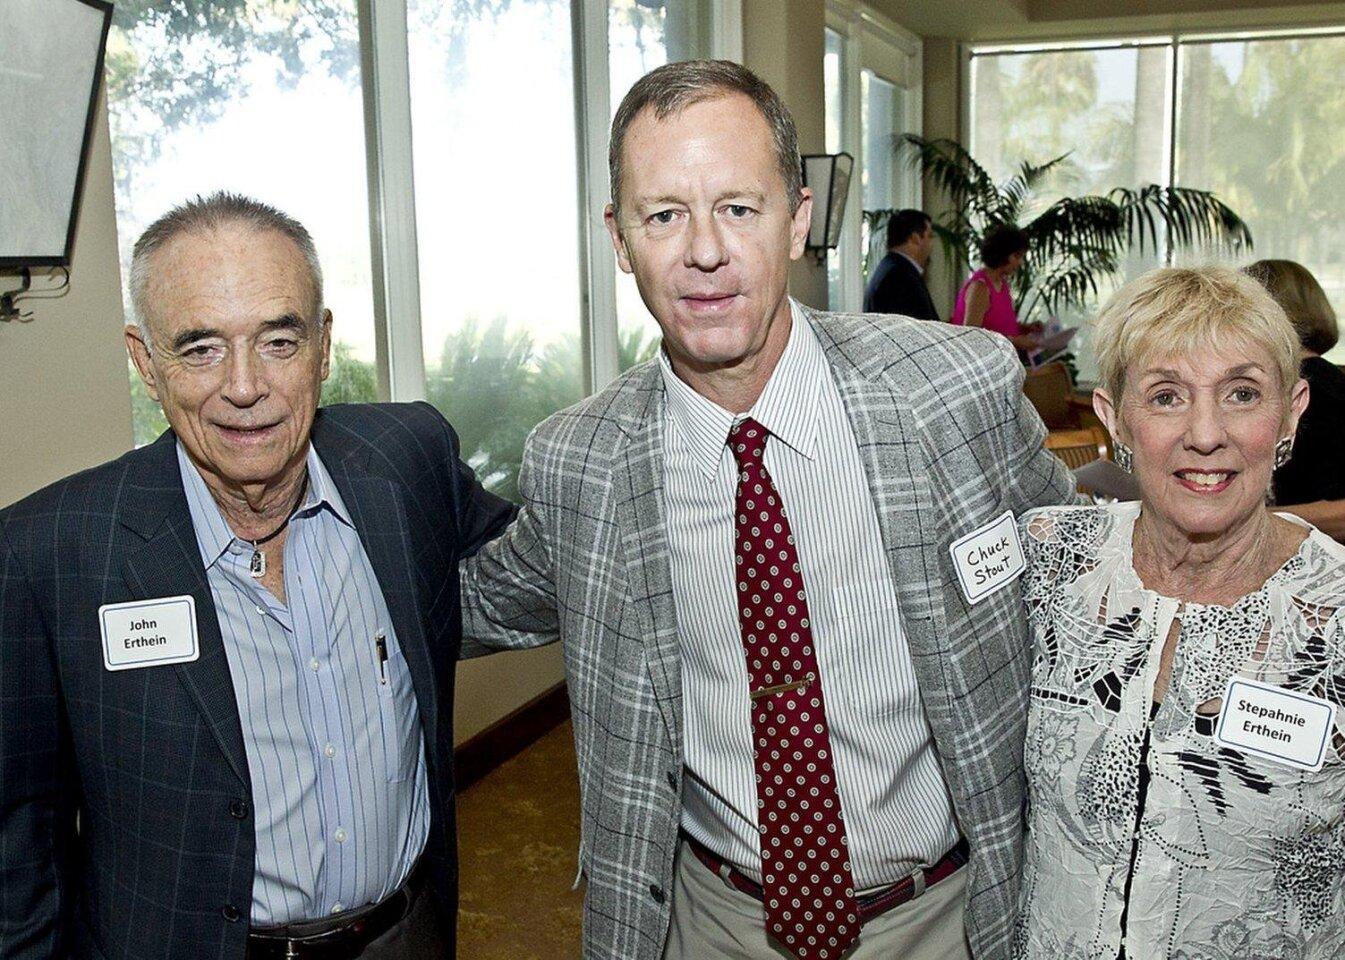 John Erthein, Chuck Stout, Stephanie Ertheim